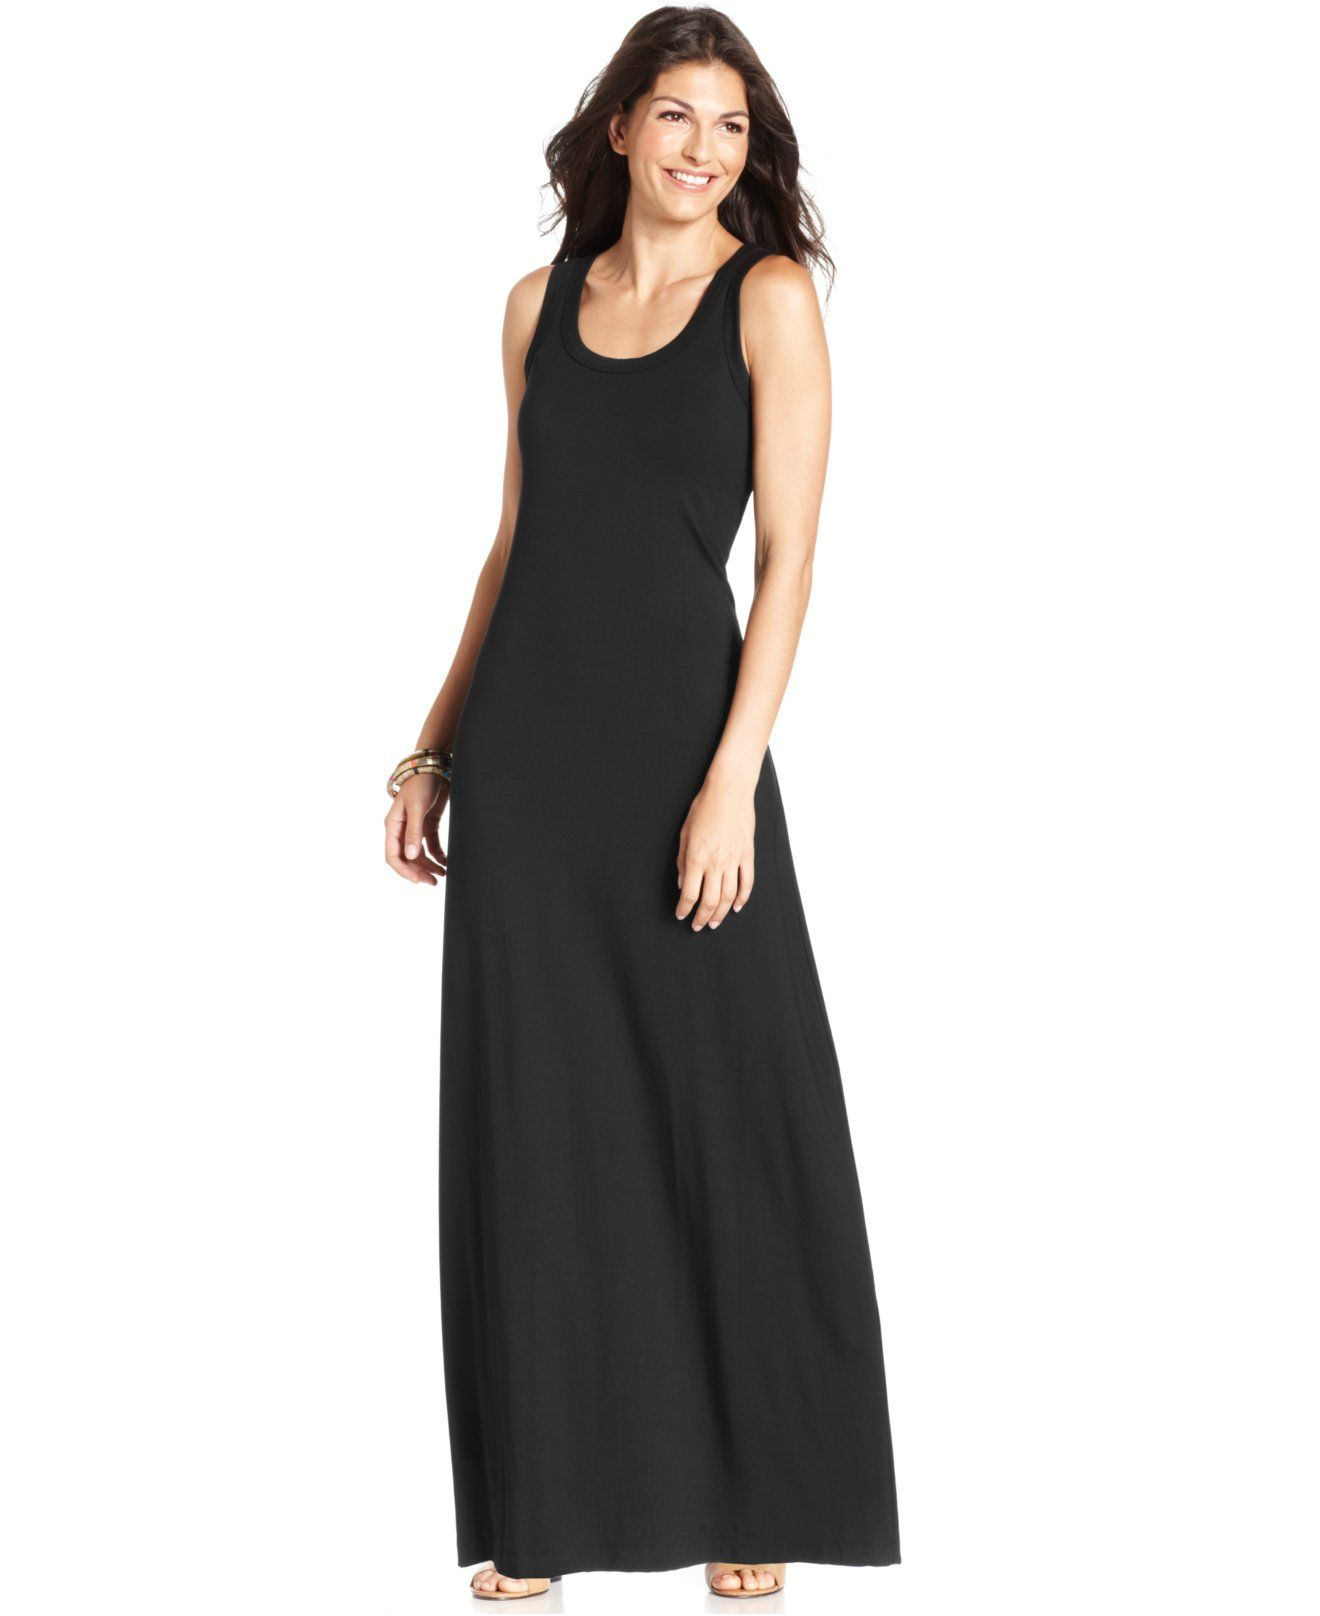 Karen Kane Scoop Neck Maxi Dress Dresses Women Macy S Maxi Dress Womens Dresses Dresses [ 1616 x 1320 Pixel ]